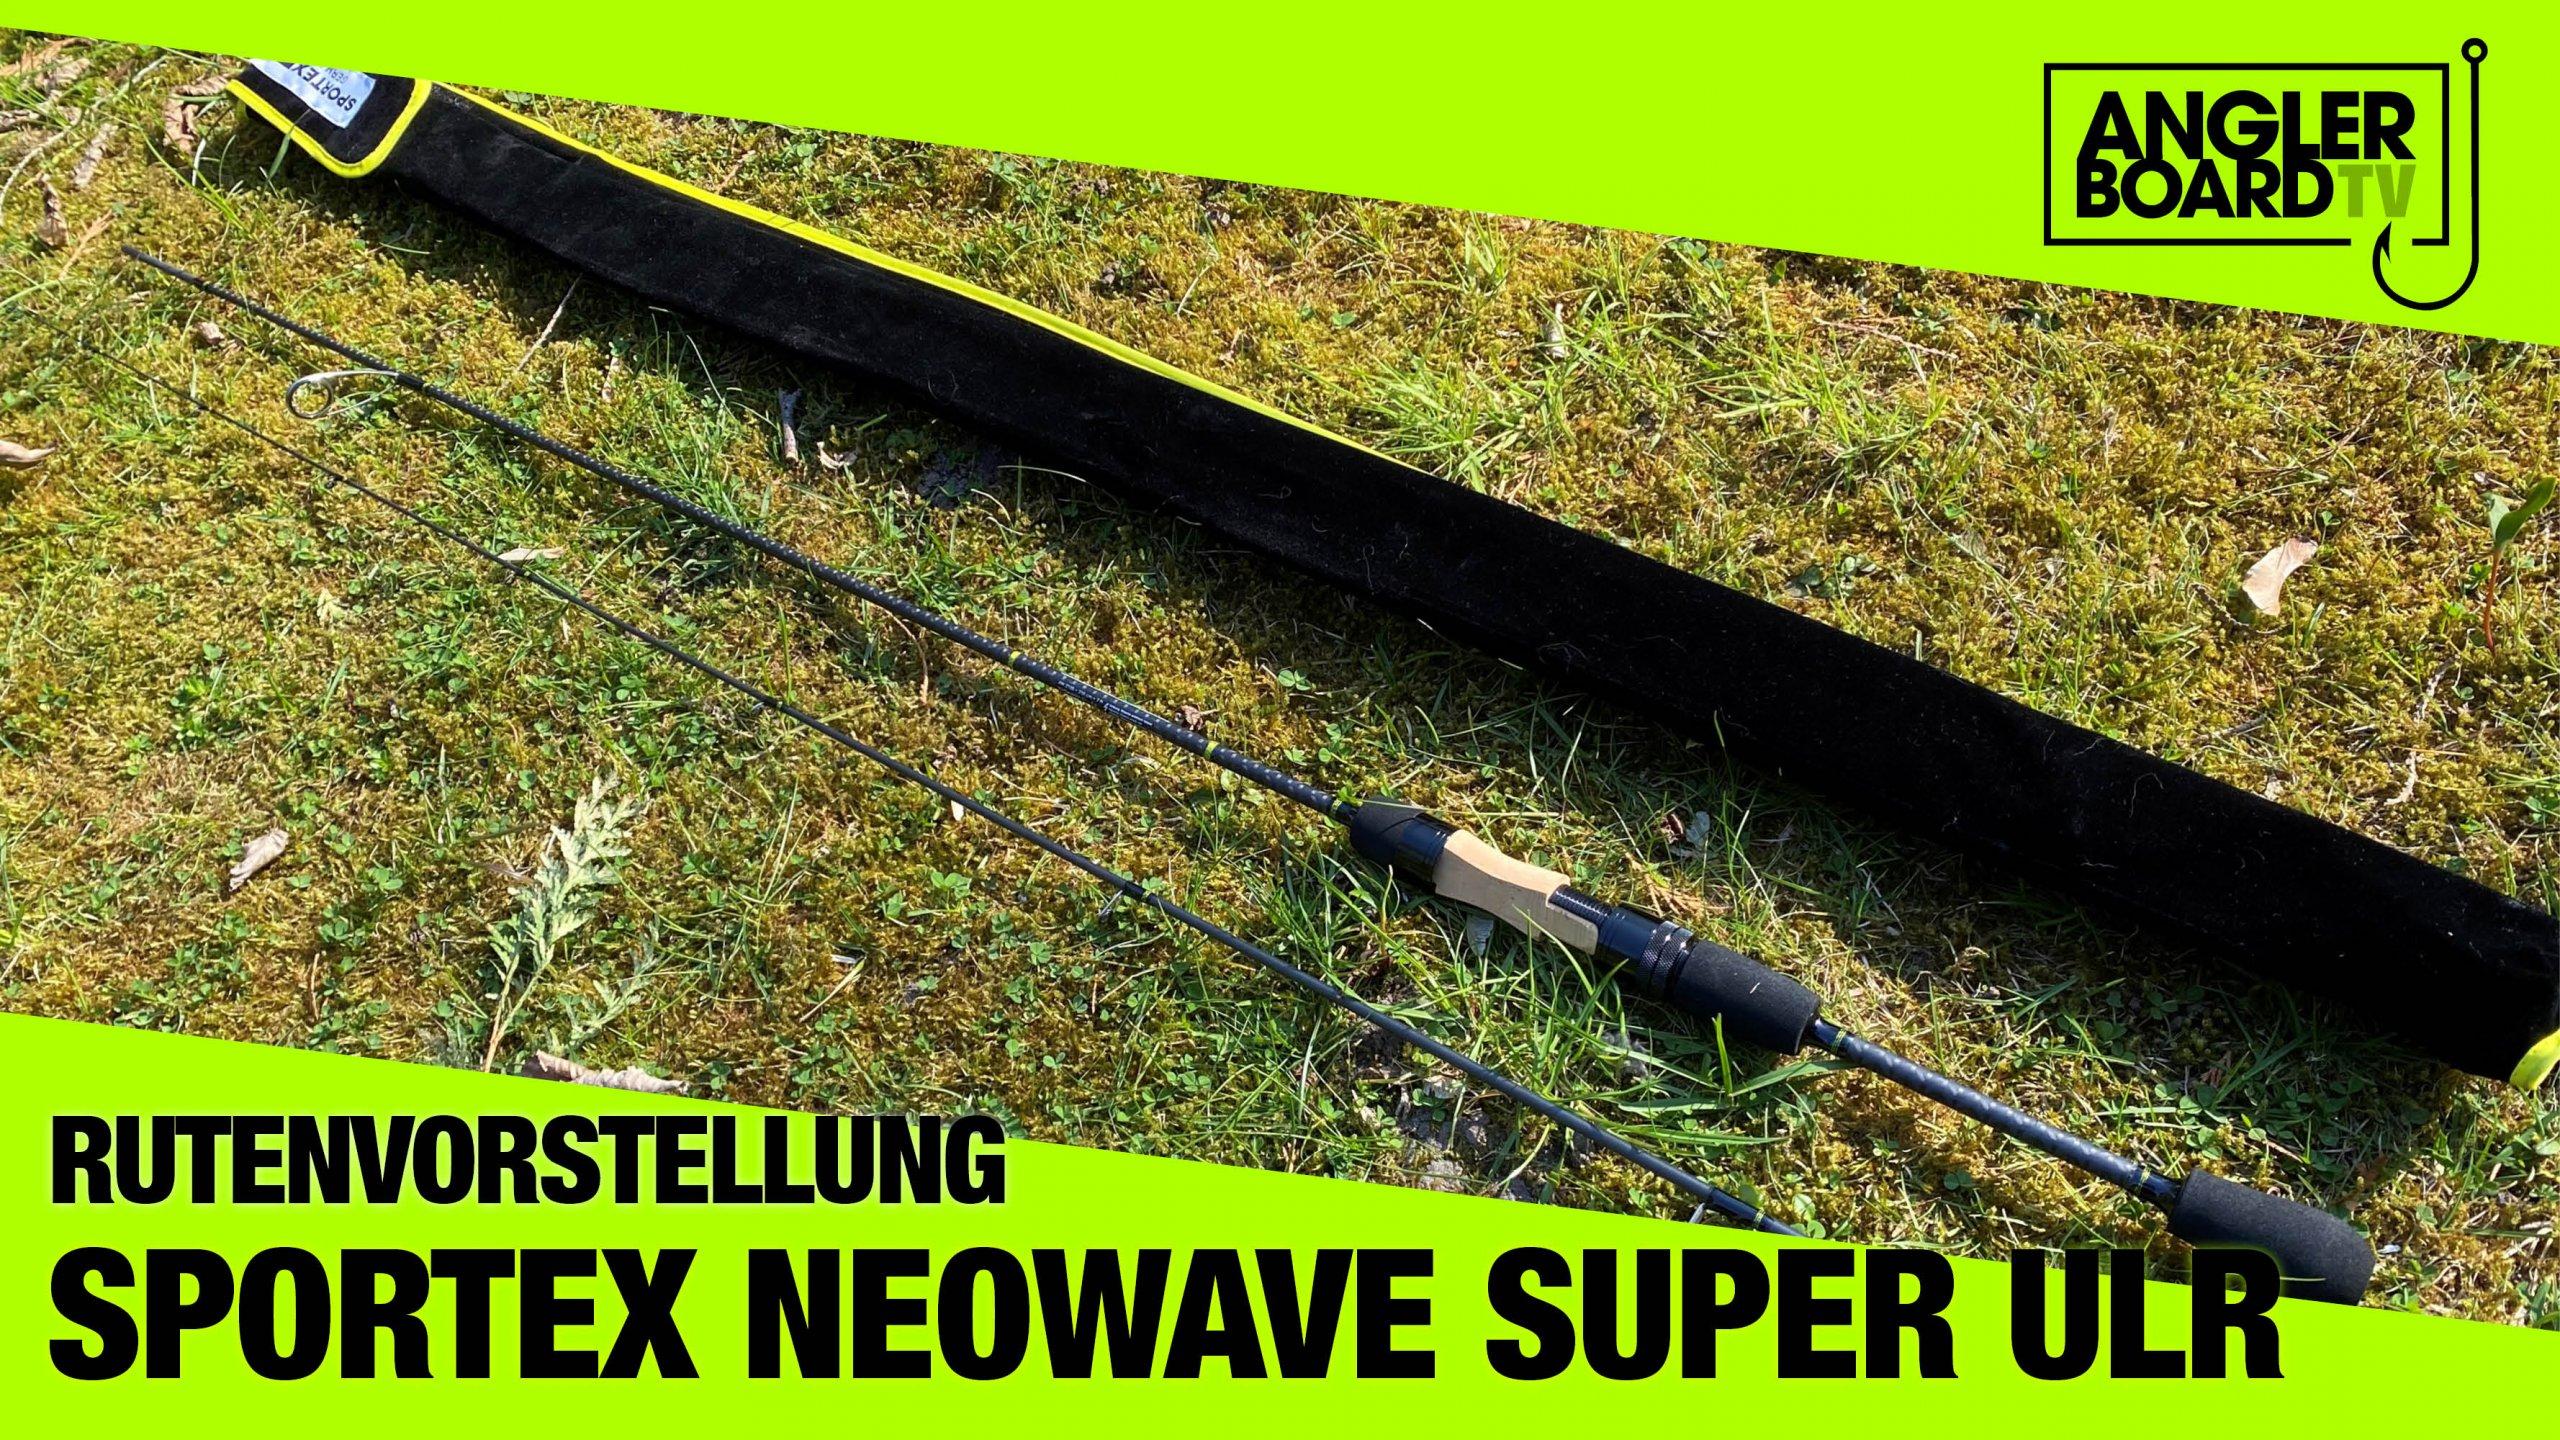 YoutTube-Thumbnail_1280x720px_Sportex Neowave Super ULR.jpg